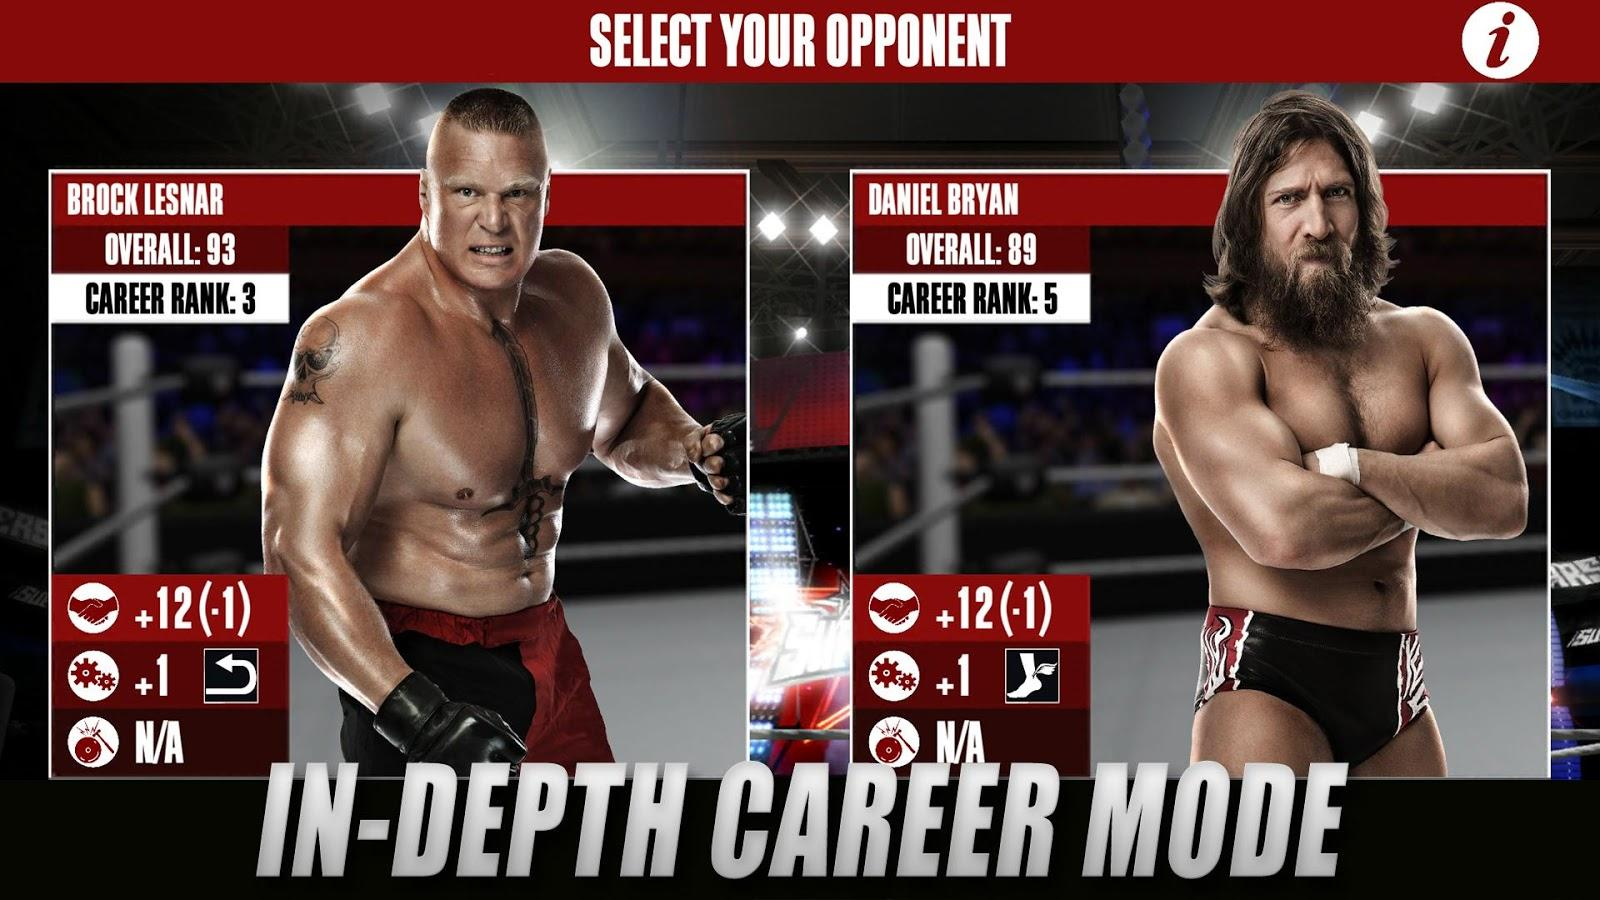 WWE 2K (MOD APK, Paid/Unlocked) v1.1.8117 4